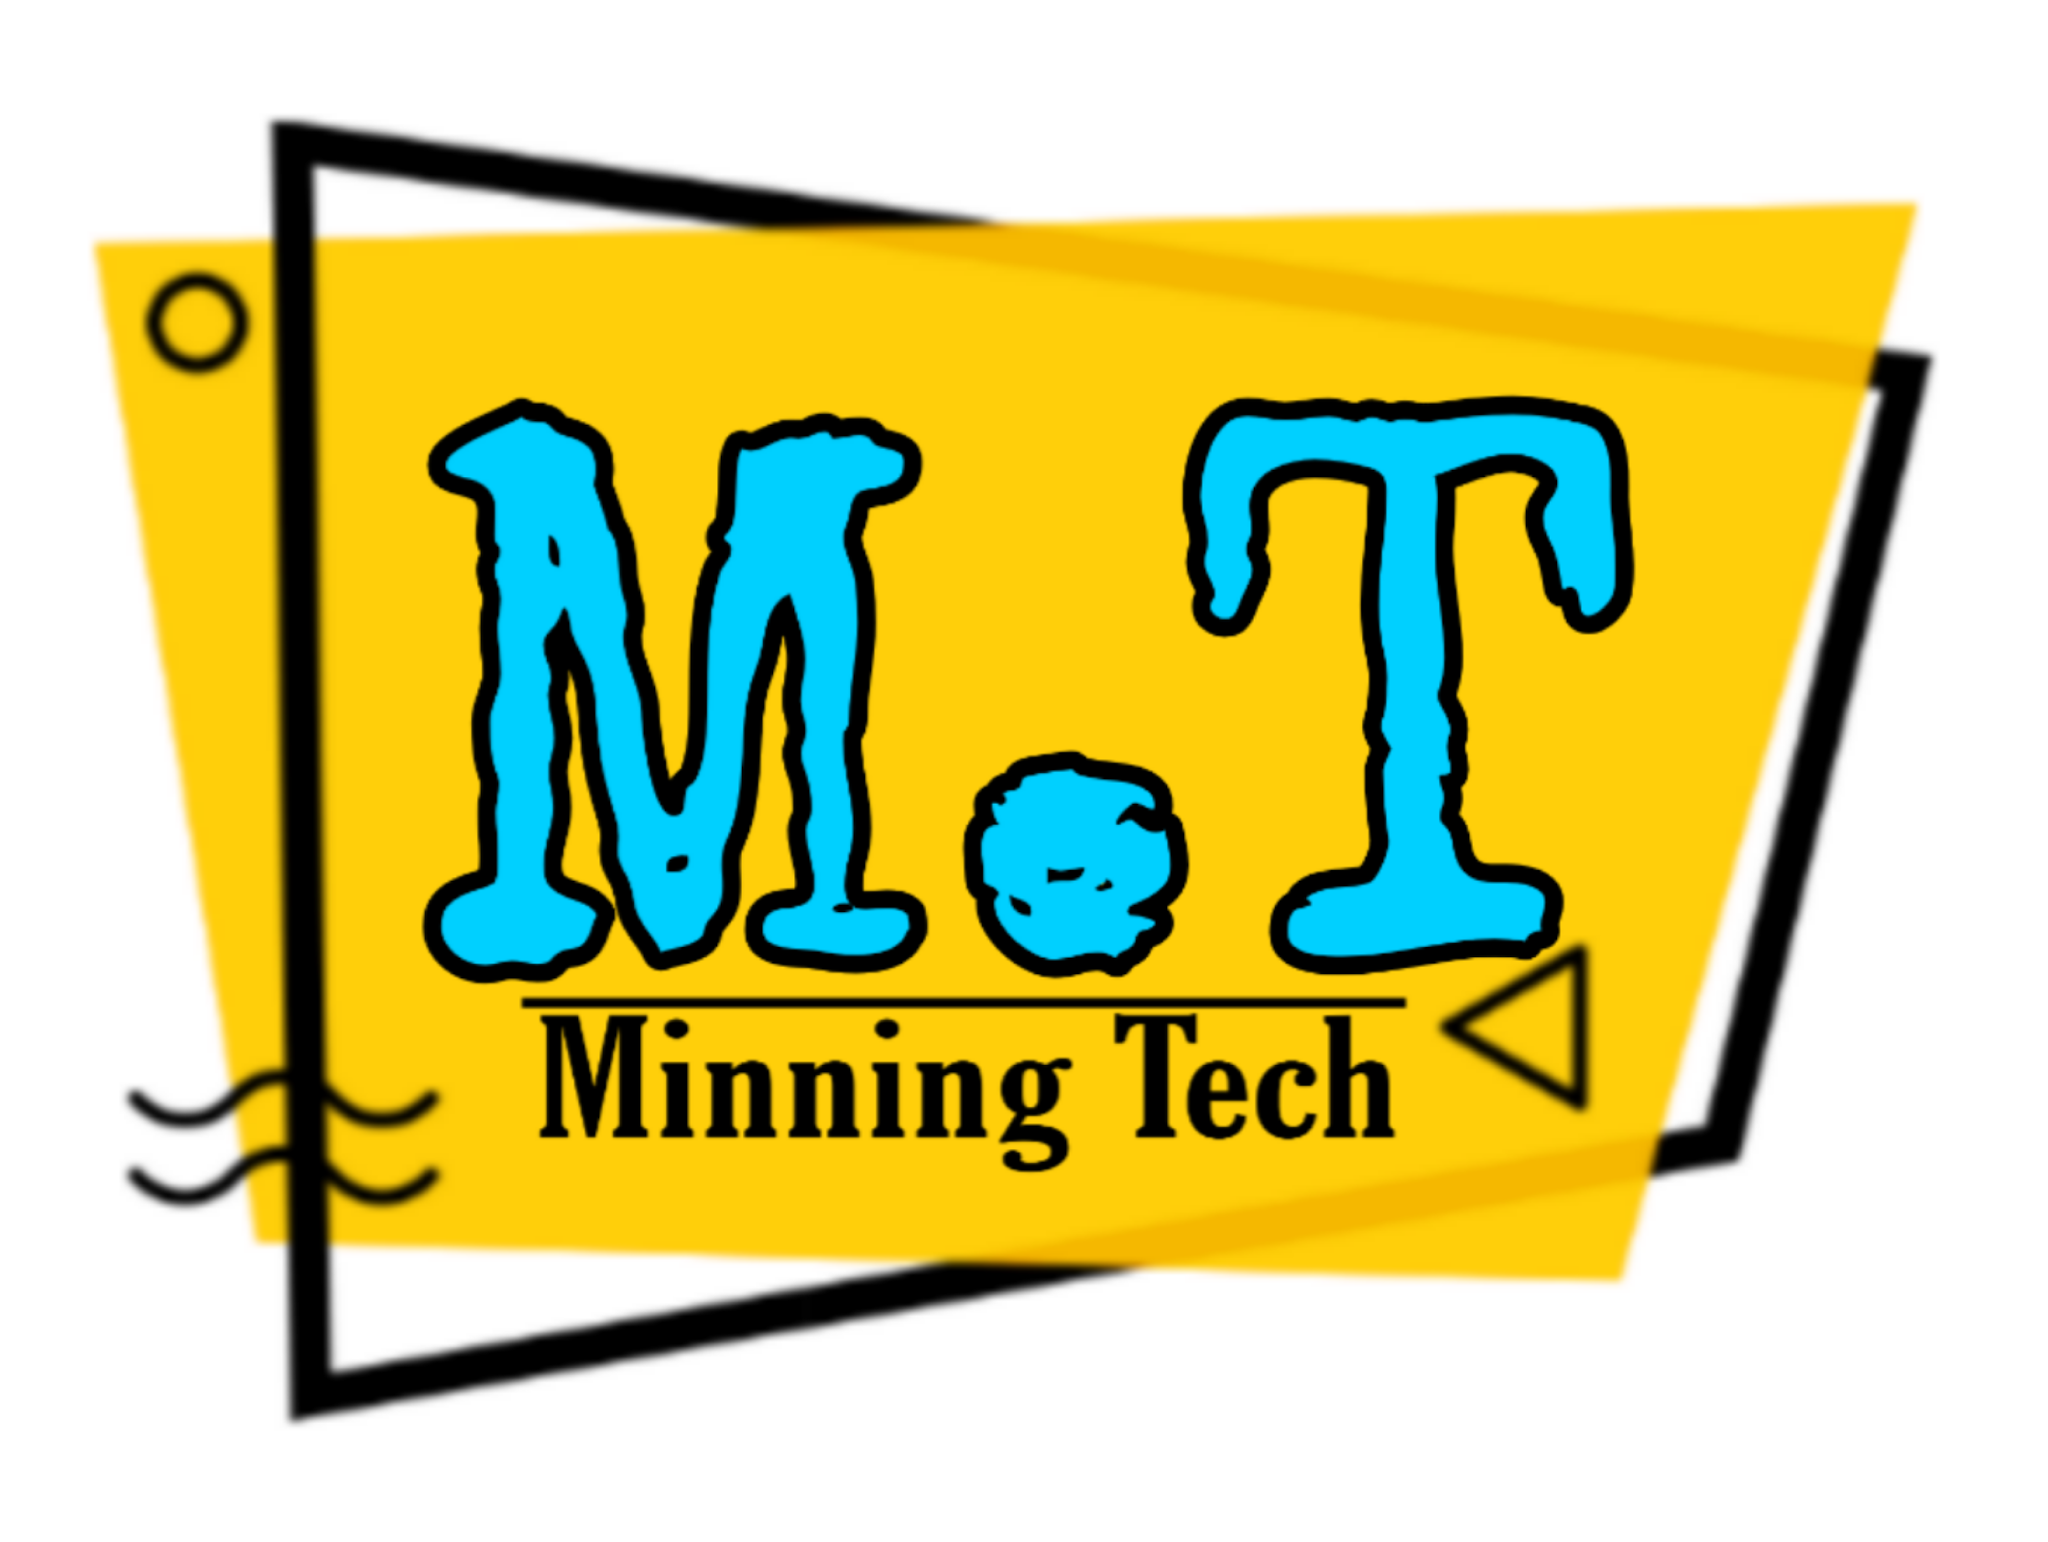 Minning Tech